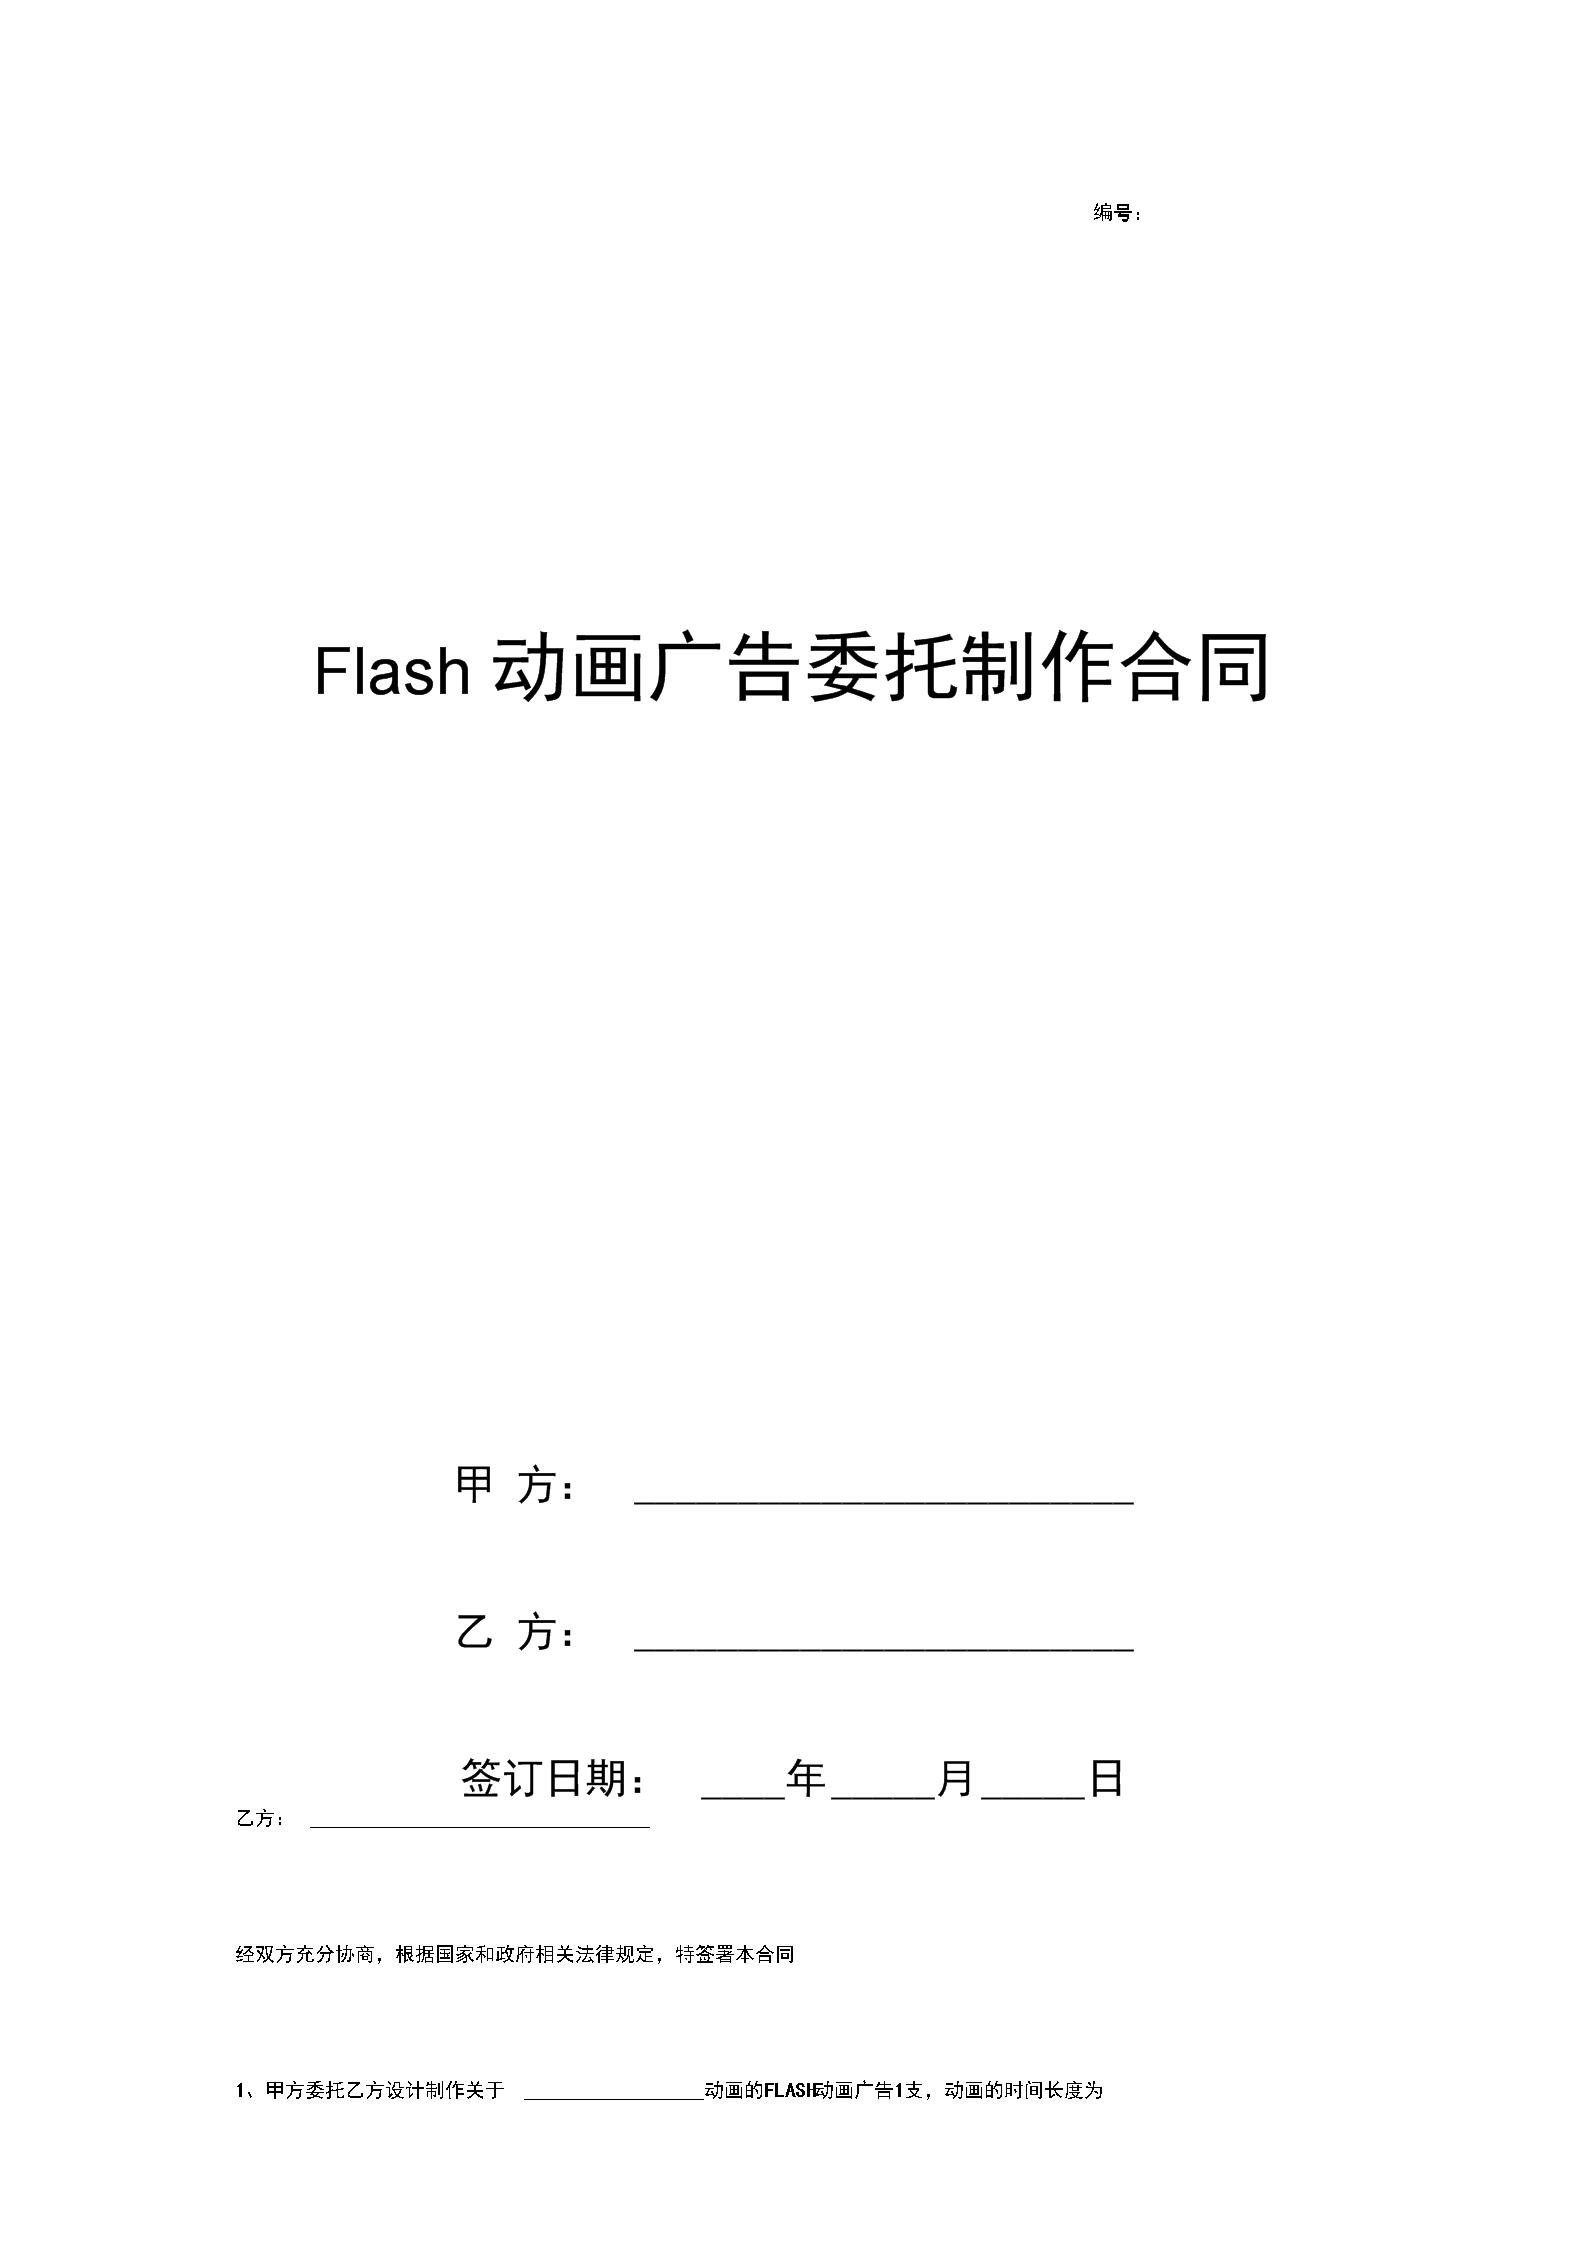 flash动画广告委托制作合同协议书范本标准版.docx